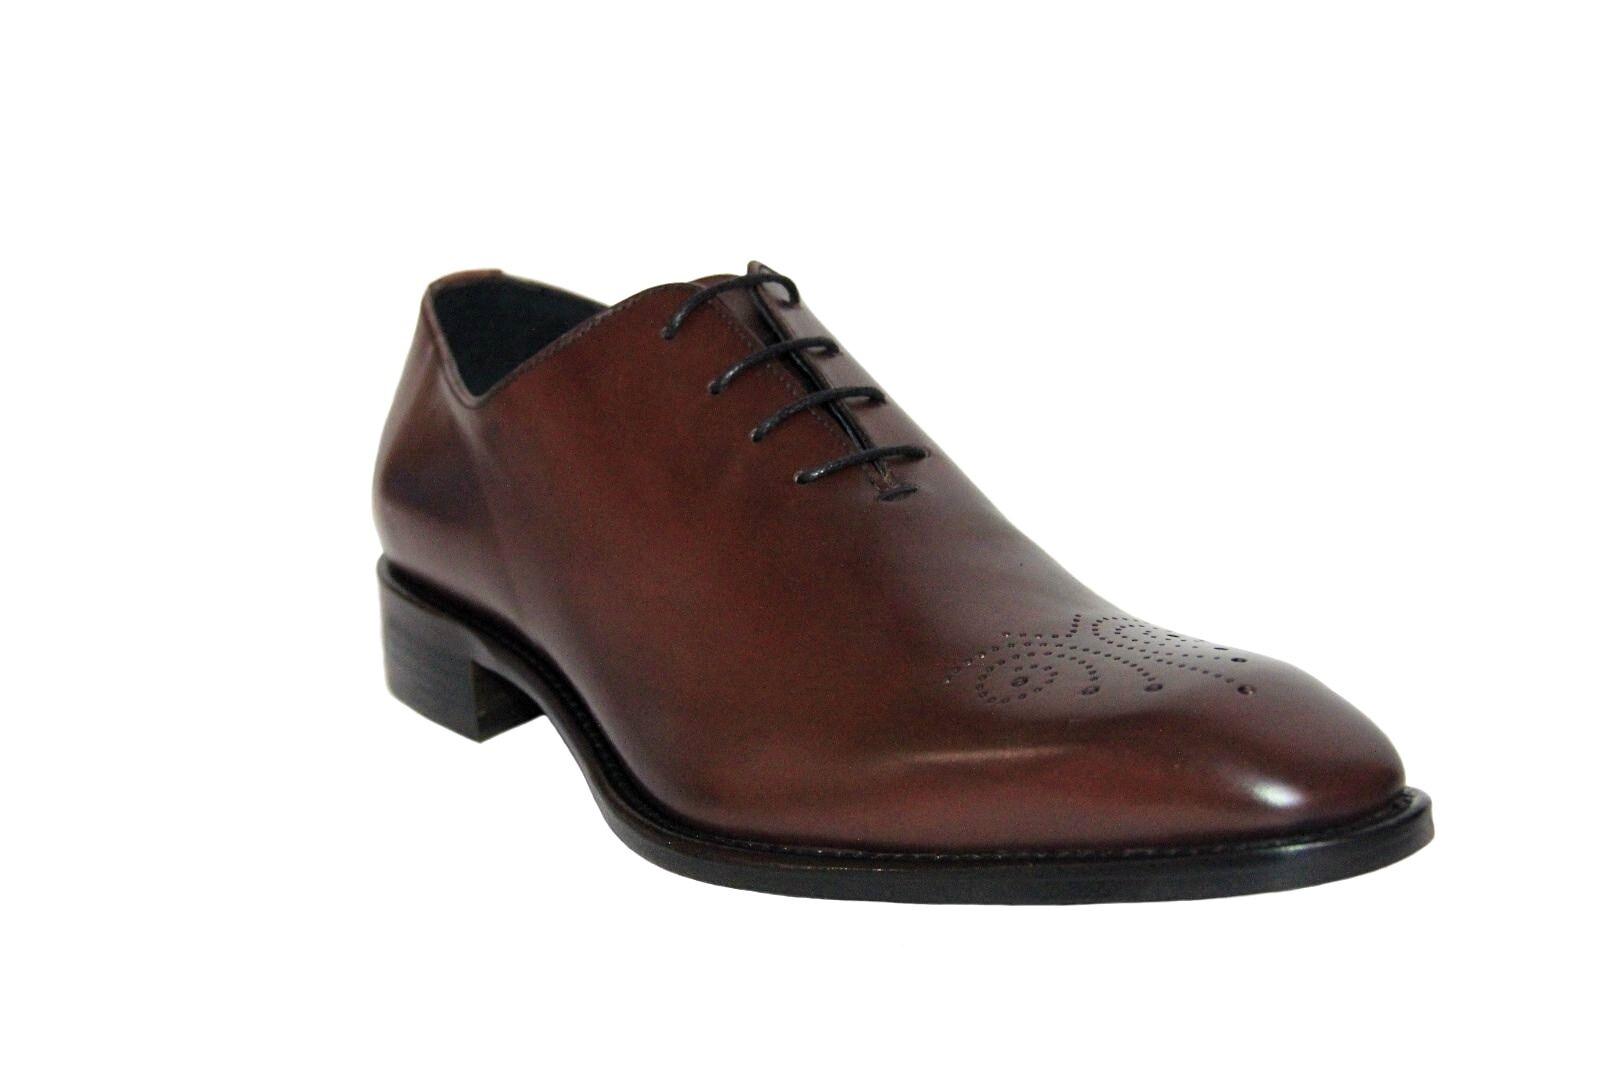 Calzoleria Toscana Men's Wholecut Oxford Burgundy Leather Dress shoes 4633